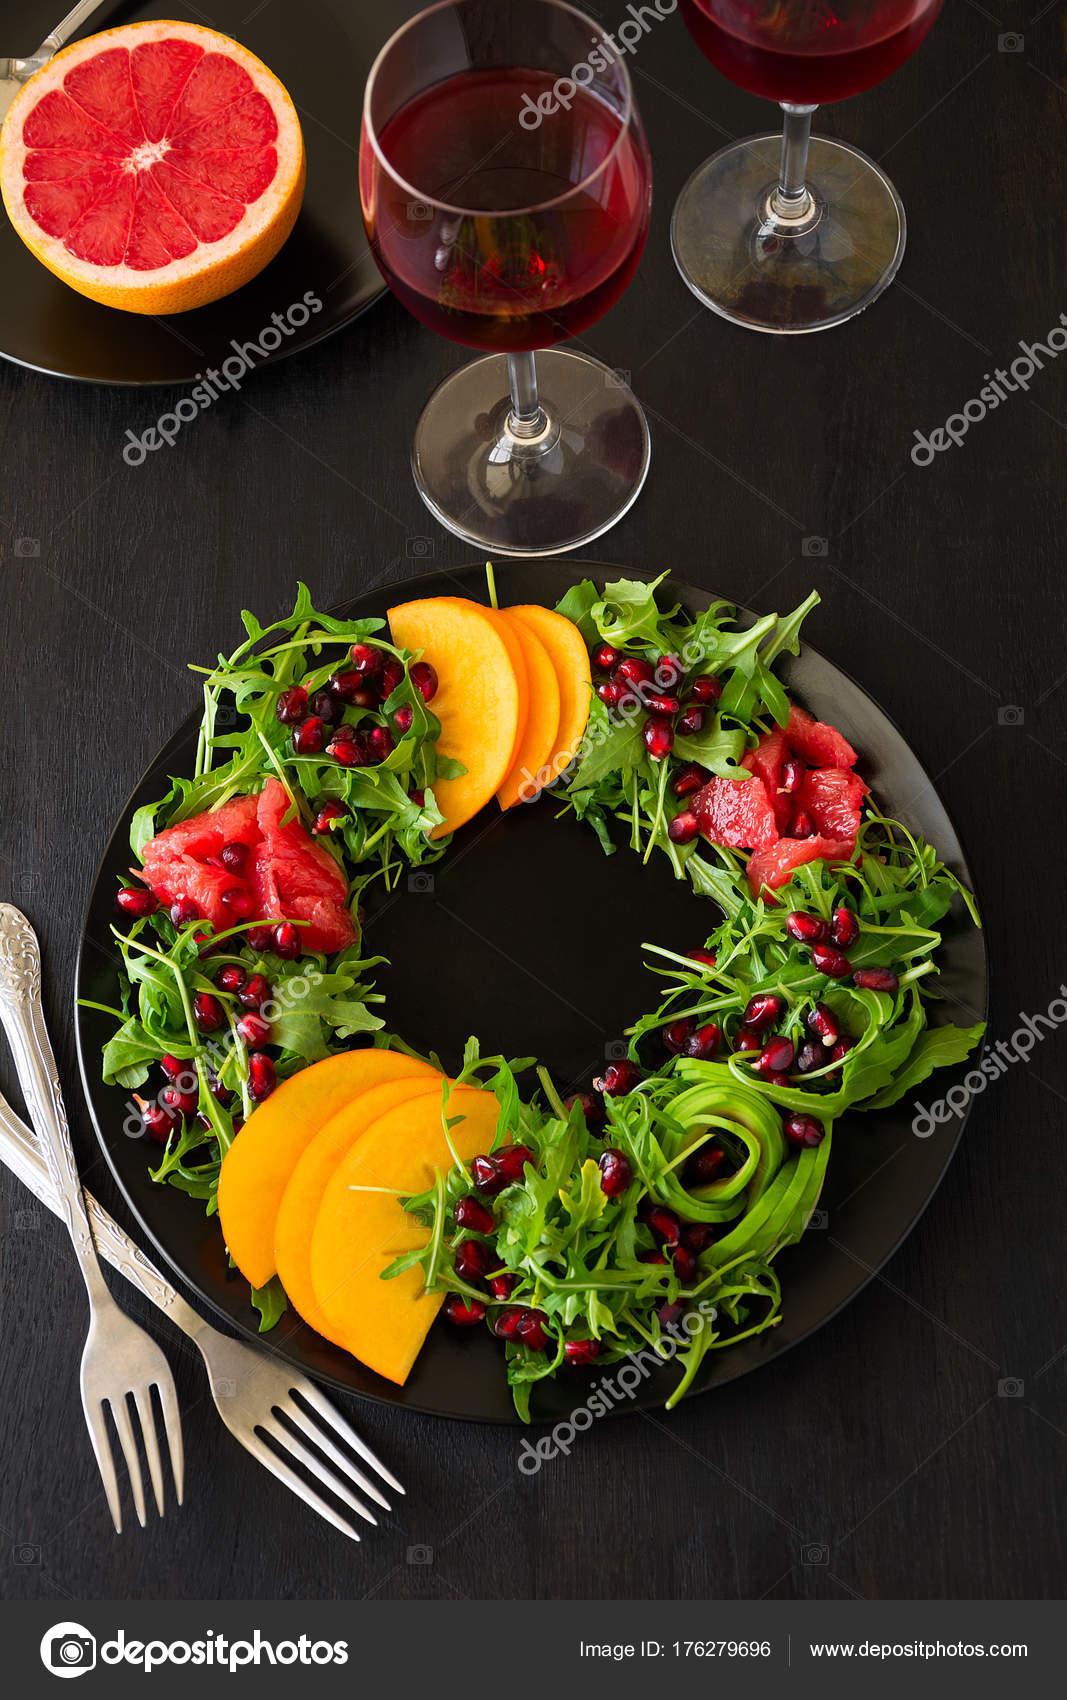 Christmas Wreath Salad Arugula Orange Avocado Grapefruit Pomegranate